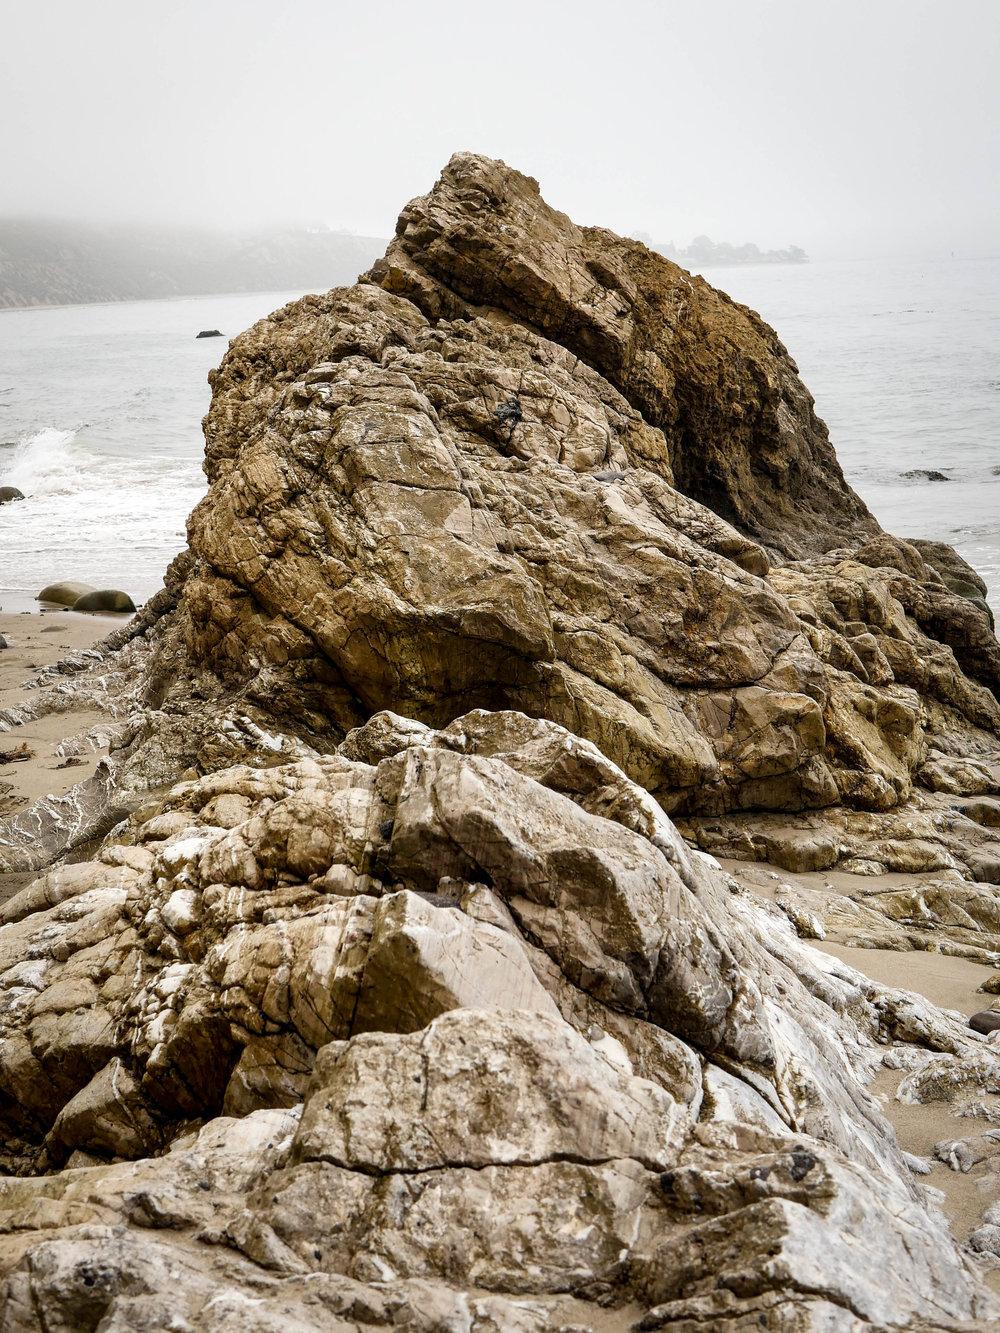 Rocks, rocks, rocks. Can you tell I like rocks?